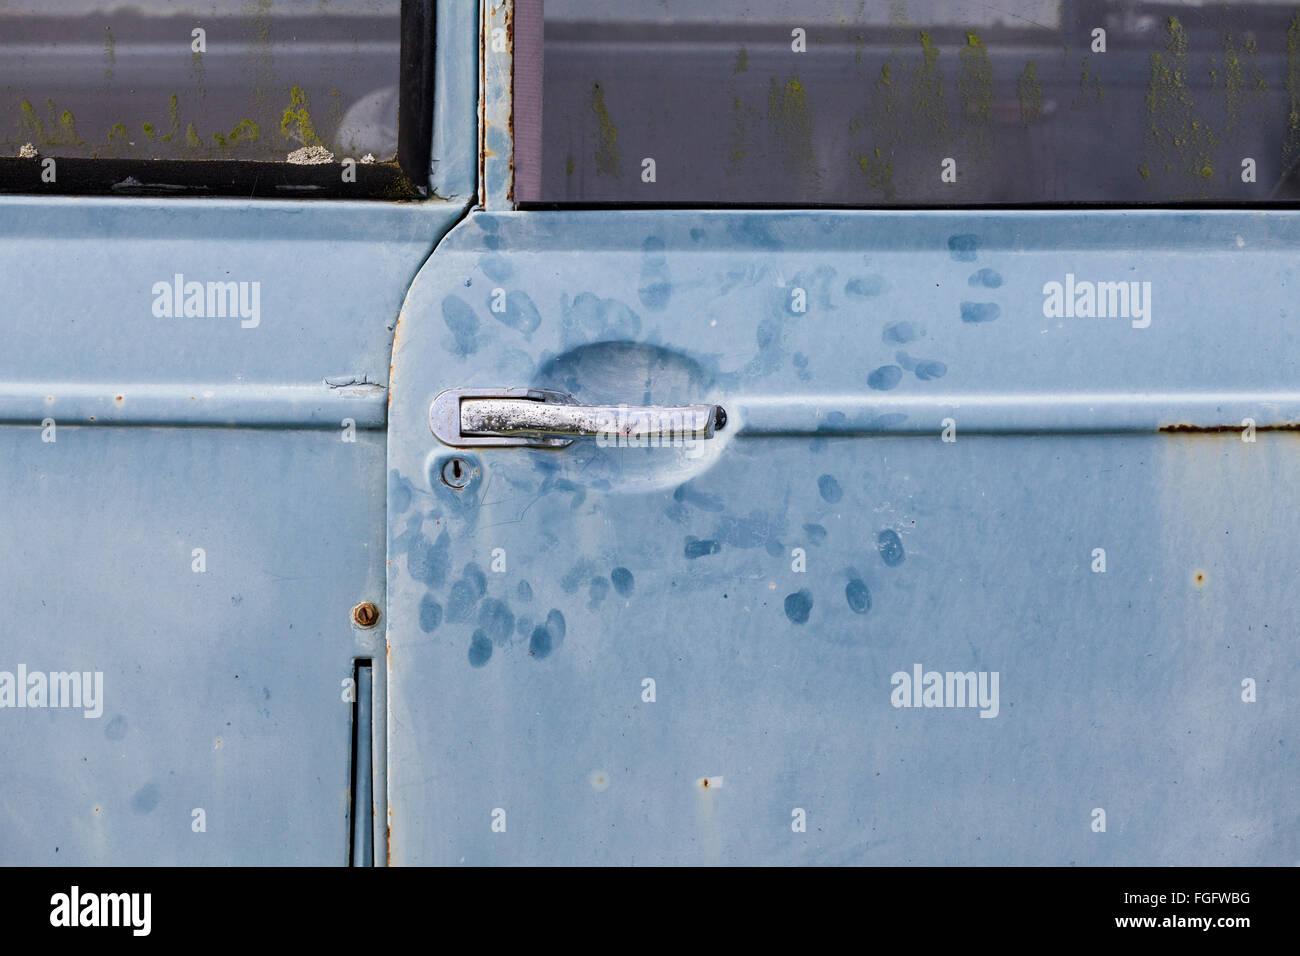 Fingerprints on an old Morris Minor. - Stock Image